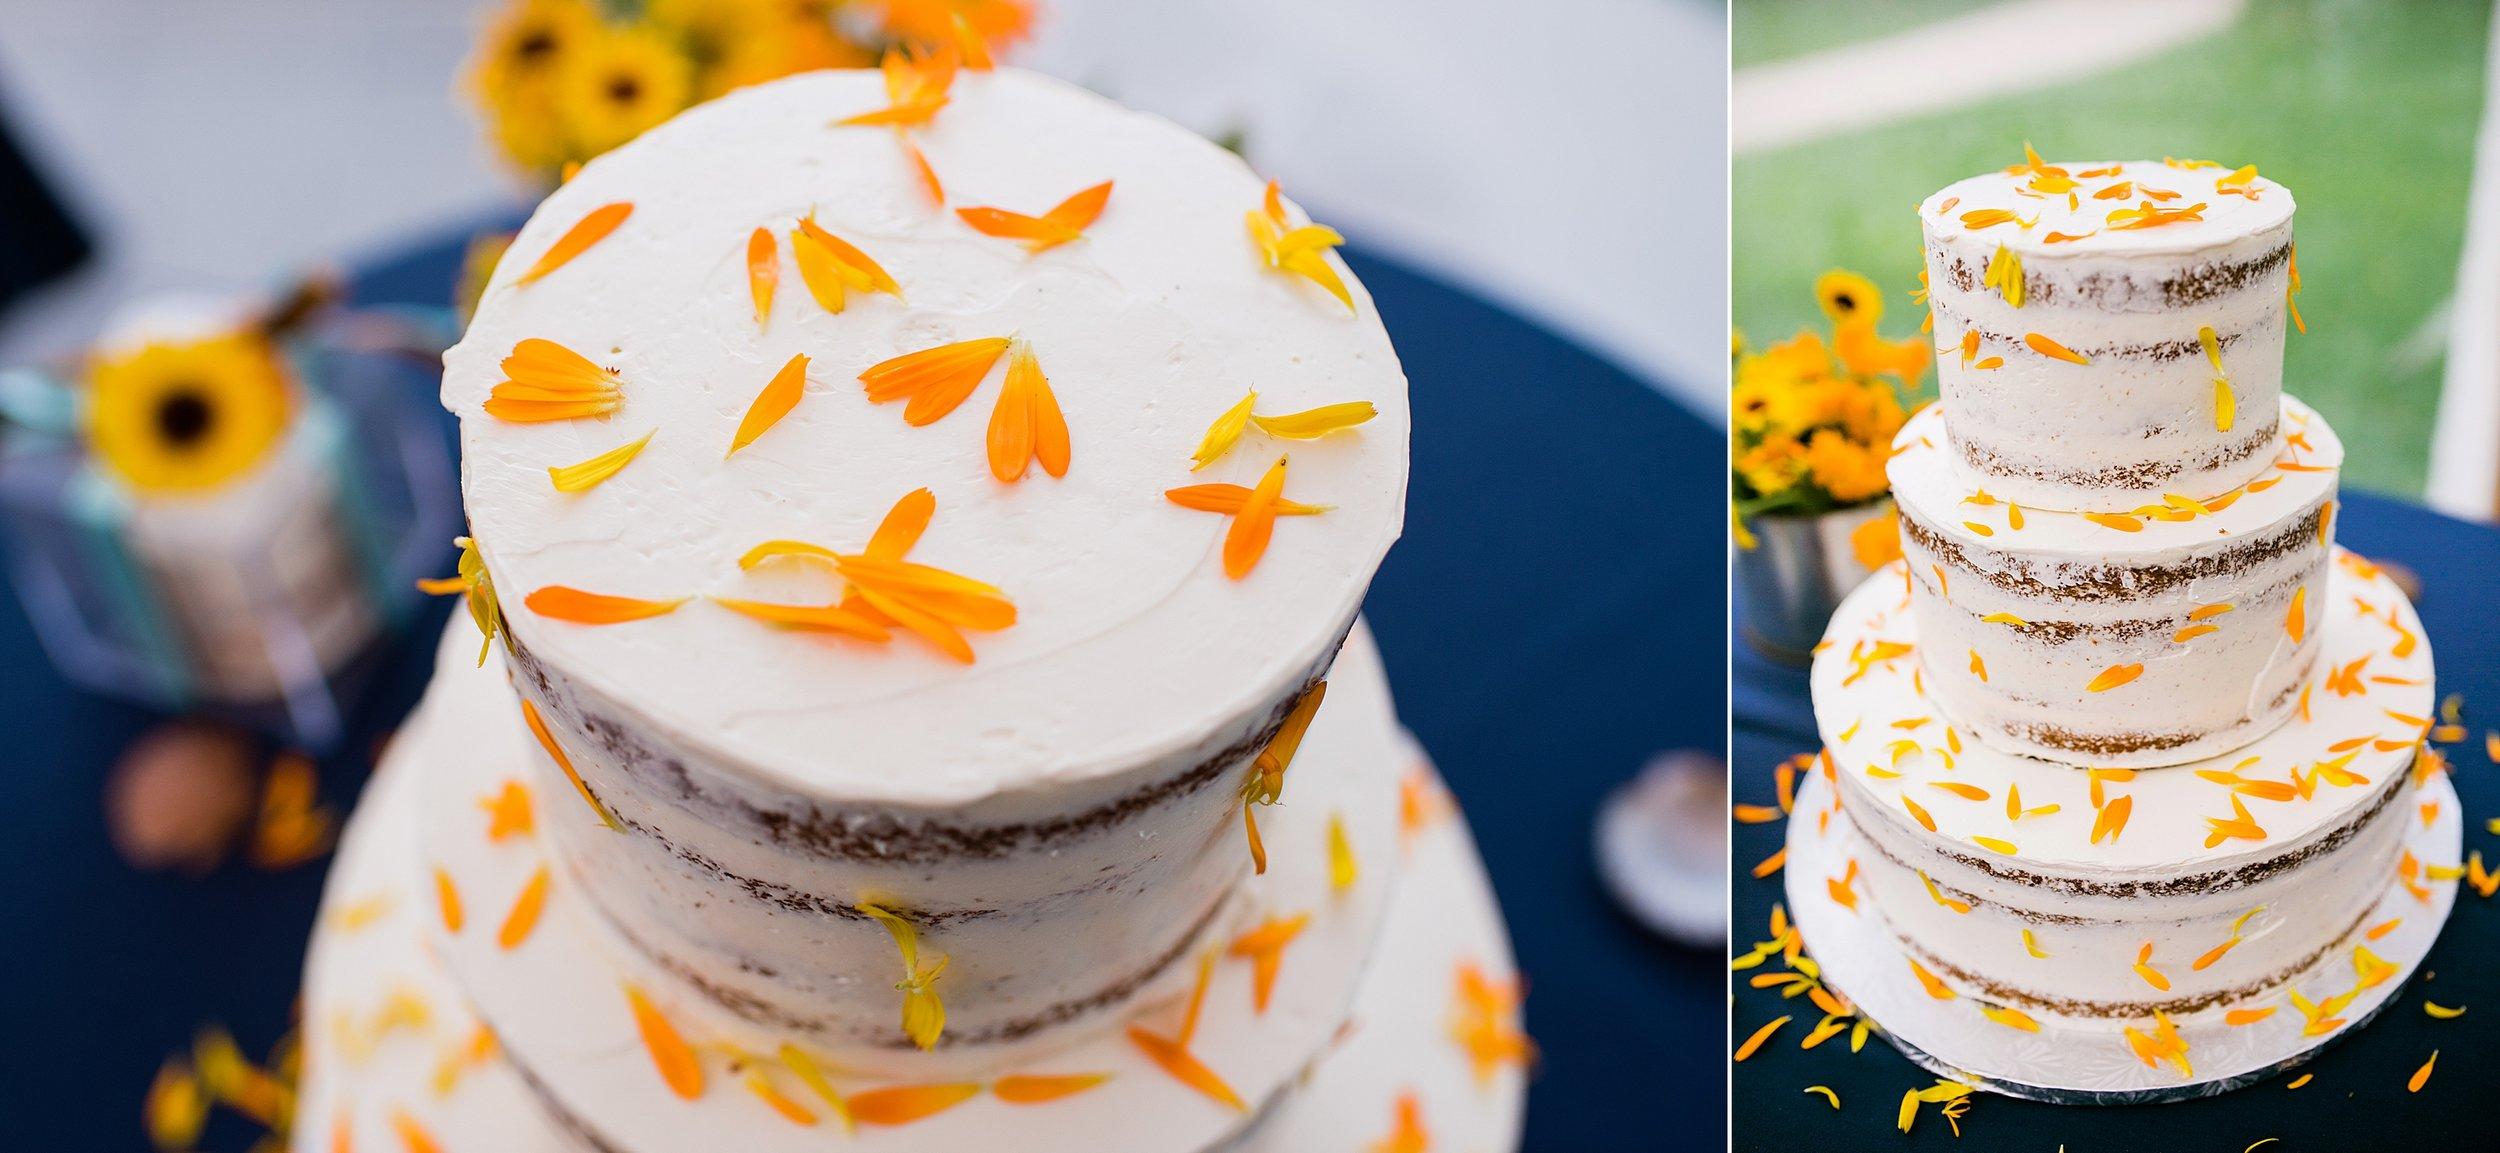 046 marthas vineyard wedding photographer todd danforth photography.jpg